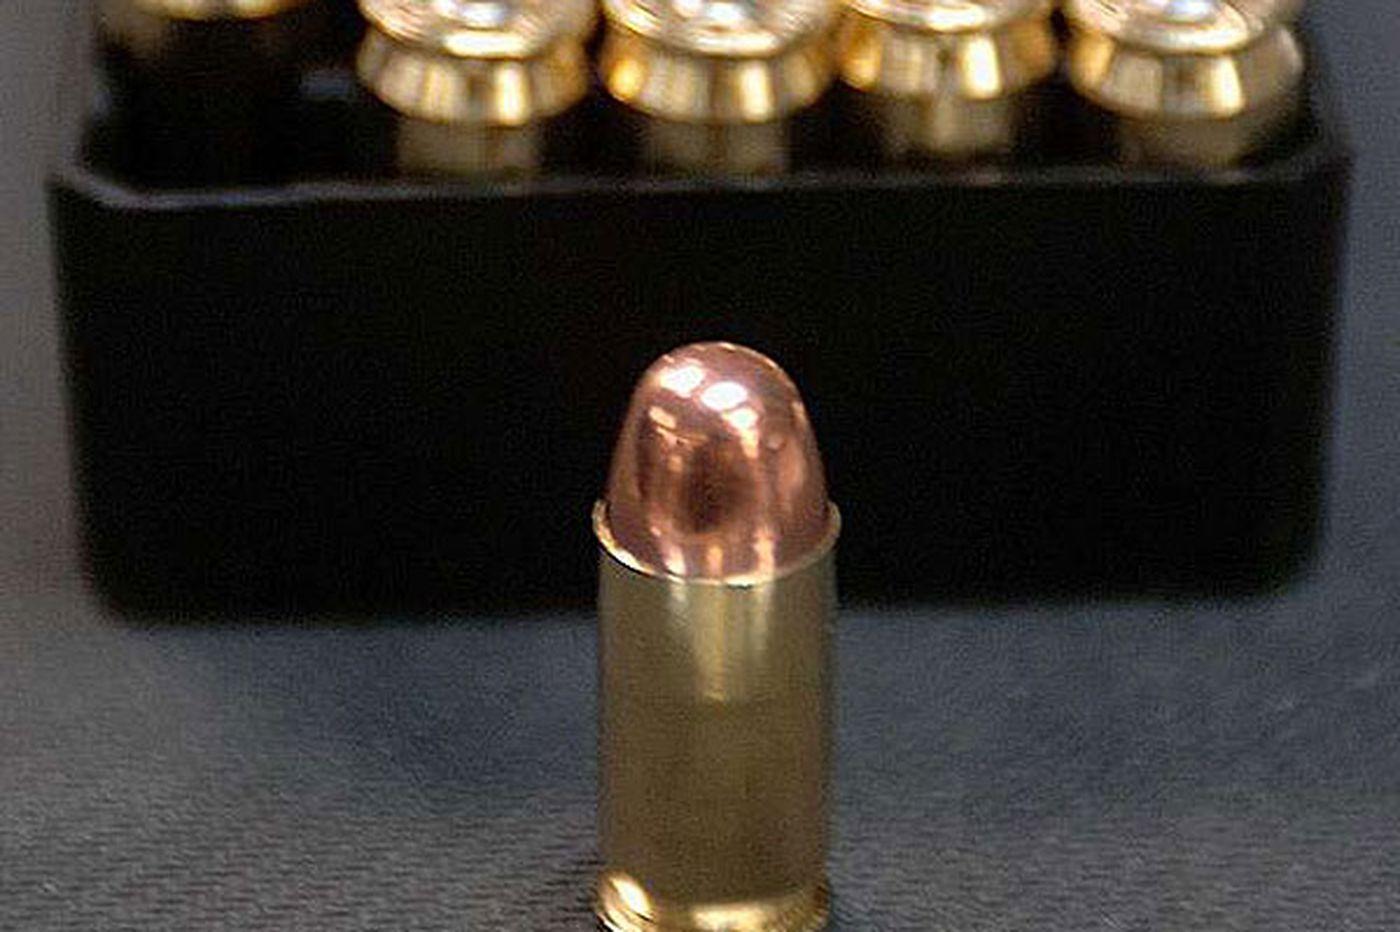 Inquirer Editorial: Fewer bullets is a good start